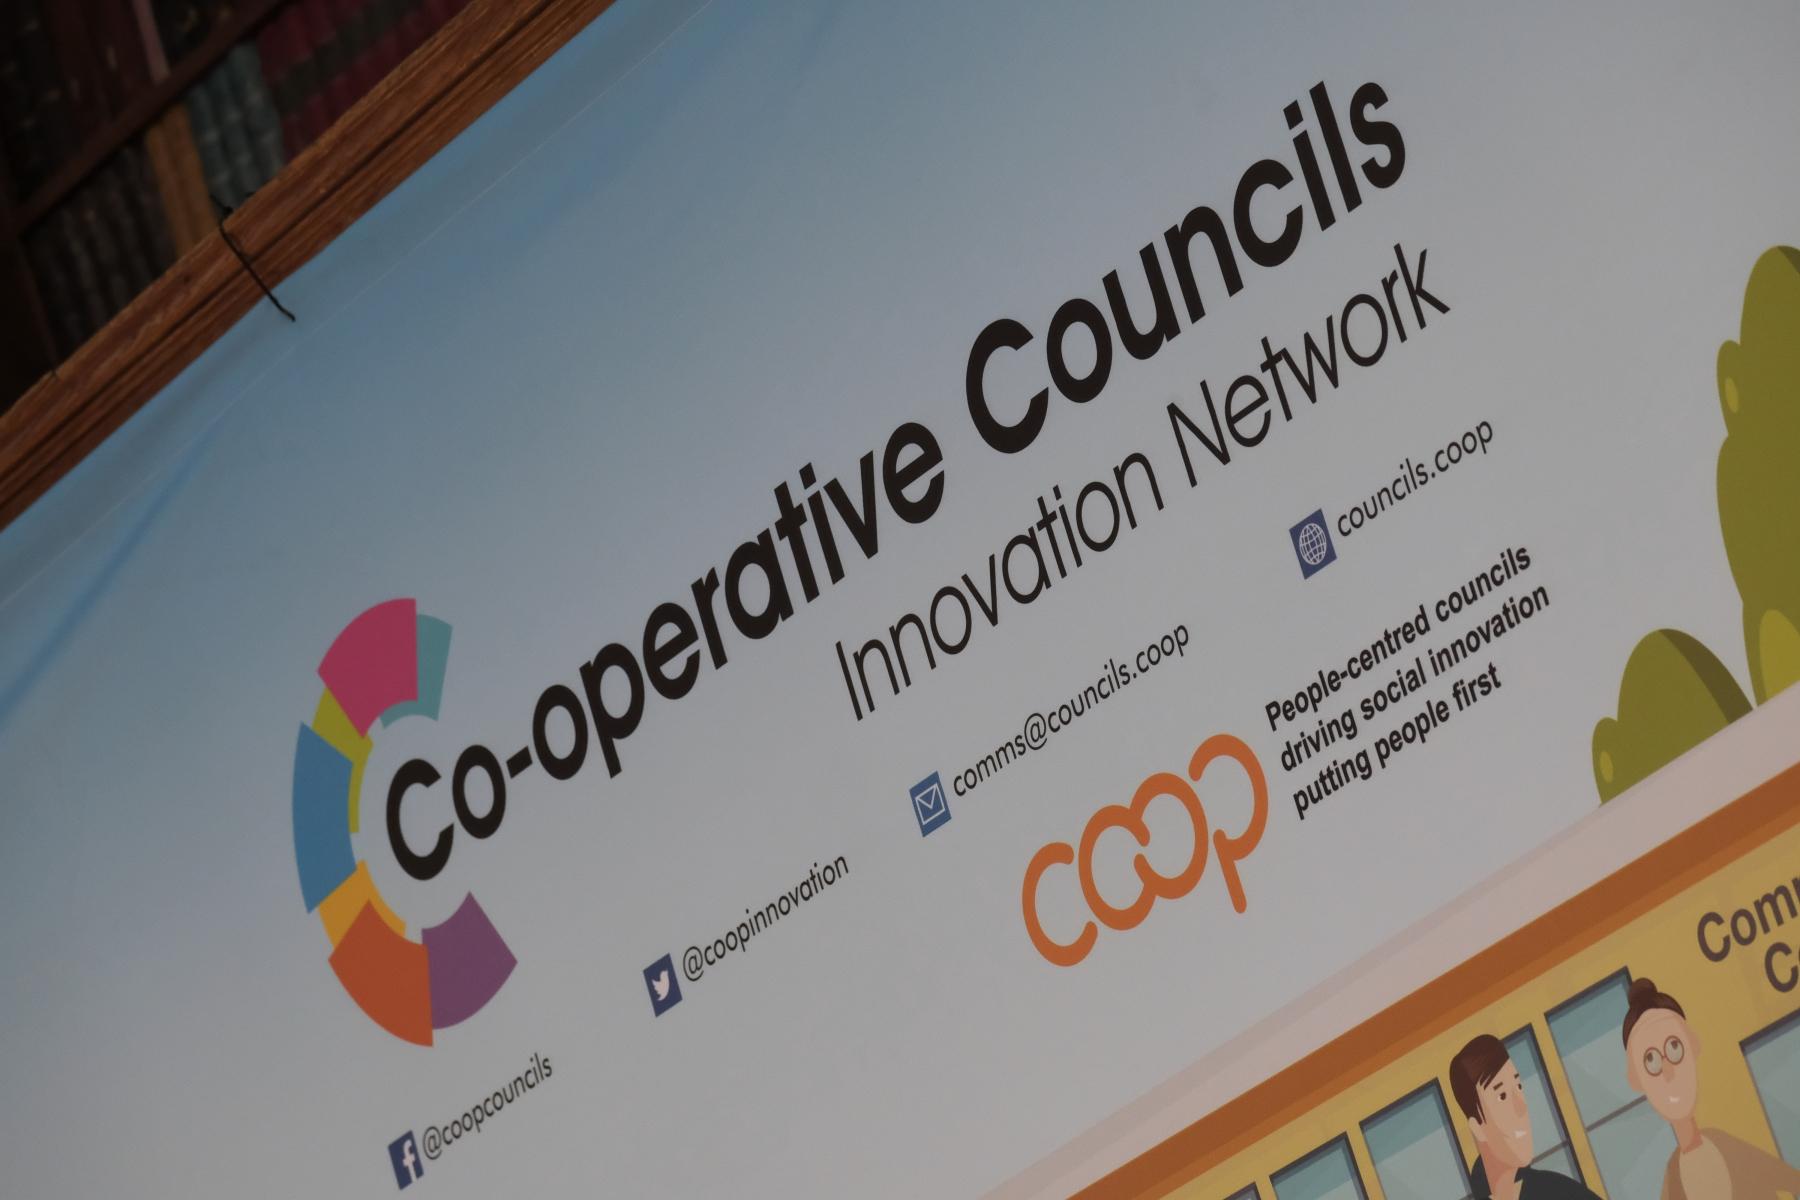 Co-Operative Council, Croydon Clock Tower, Katherine Street, Croydon. Photography by Grant Melton.